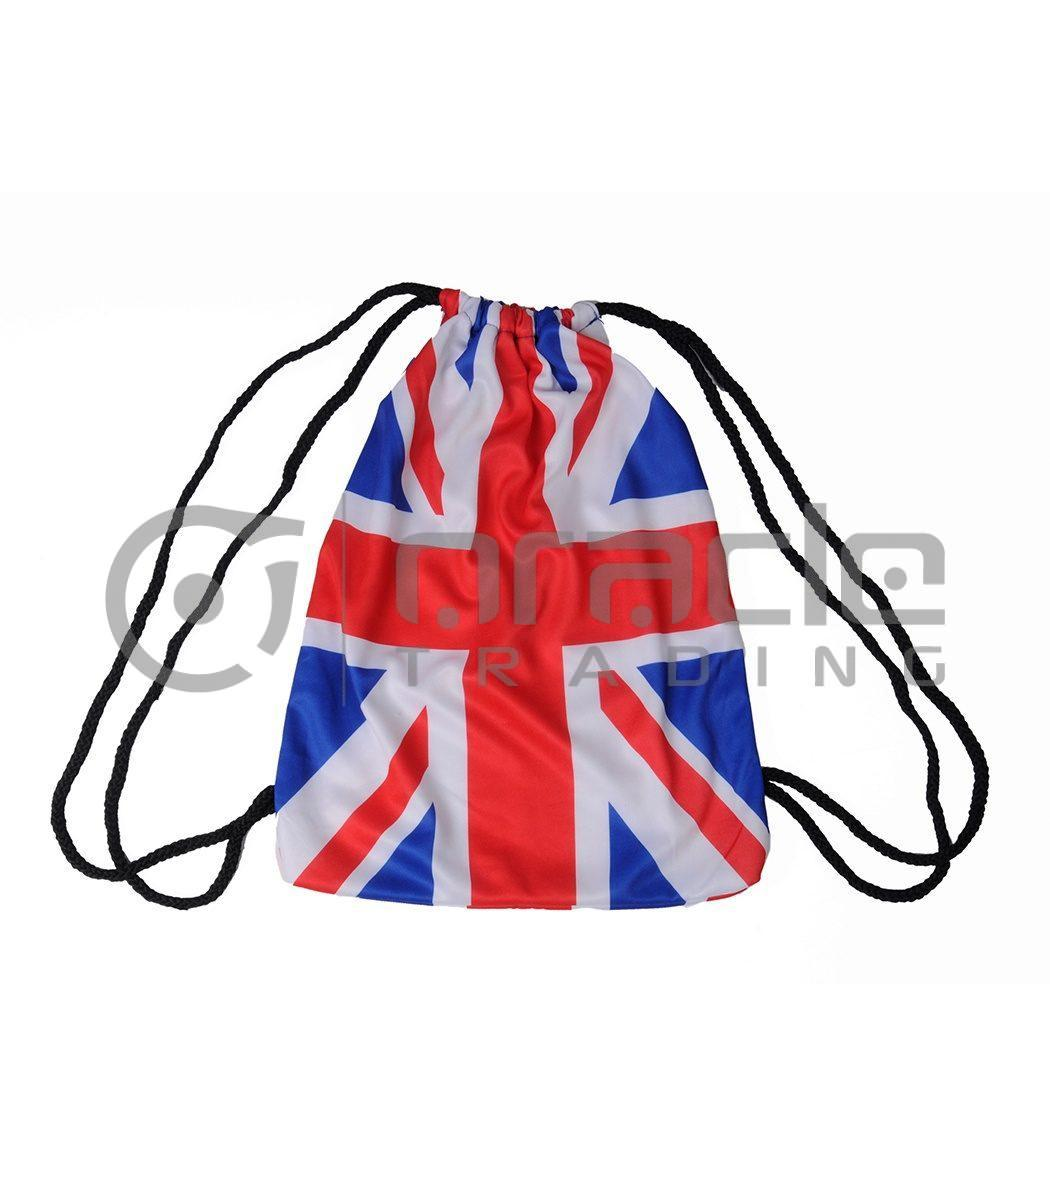 United Kingdom Gym Bag (UK)